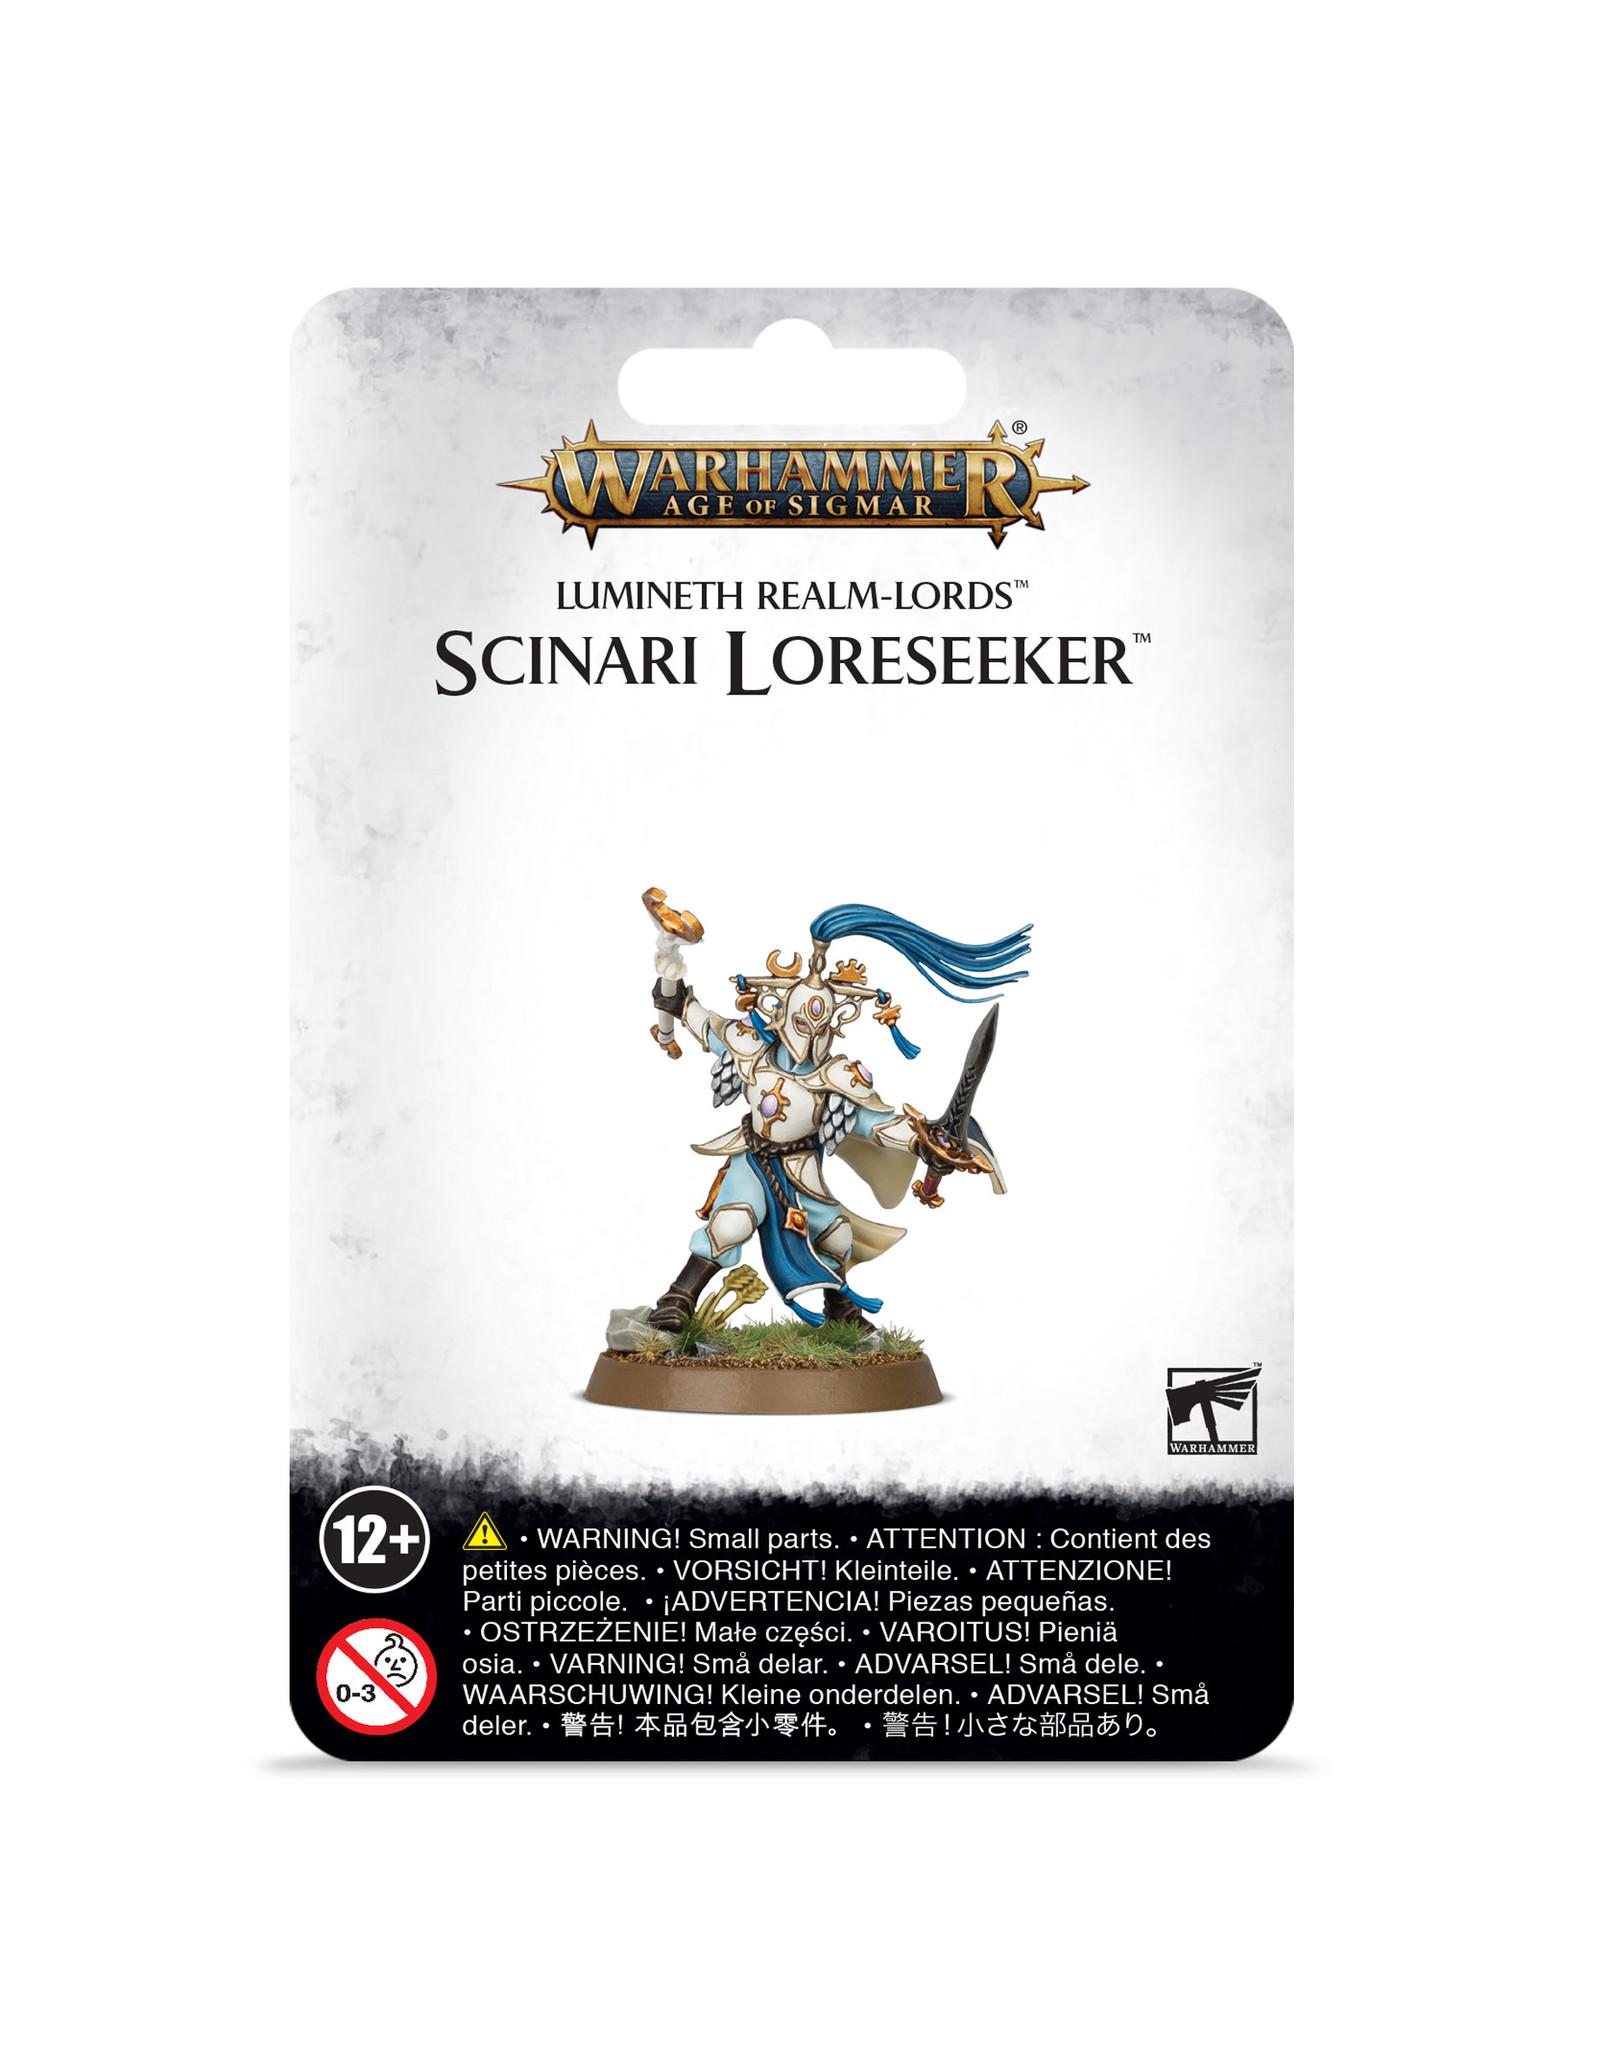 Lumineth Realm Scinari Loreseeker (AOS)